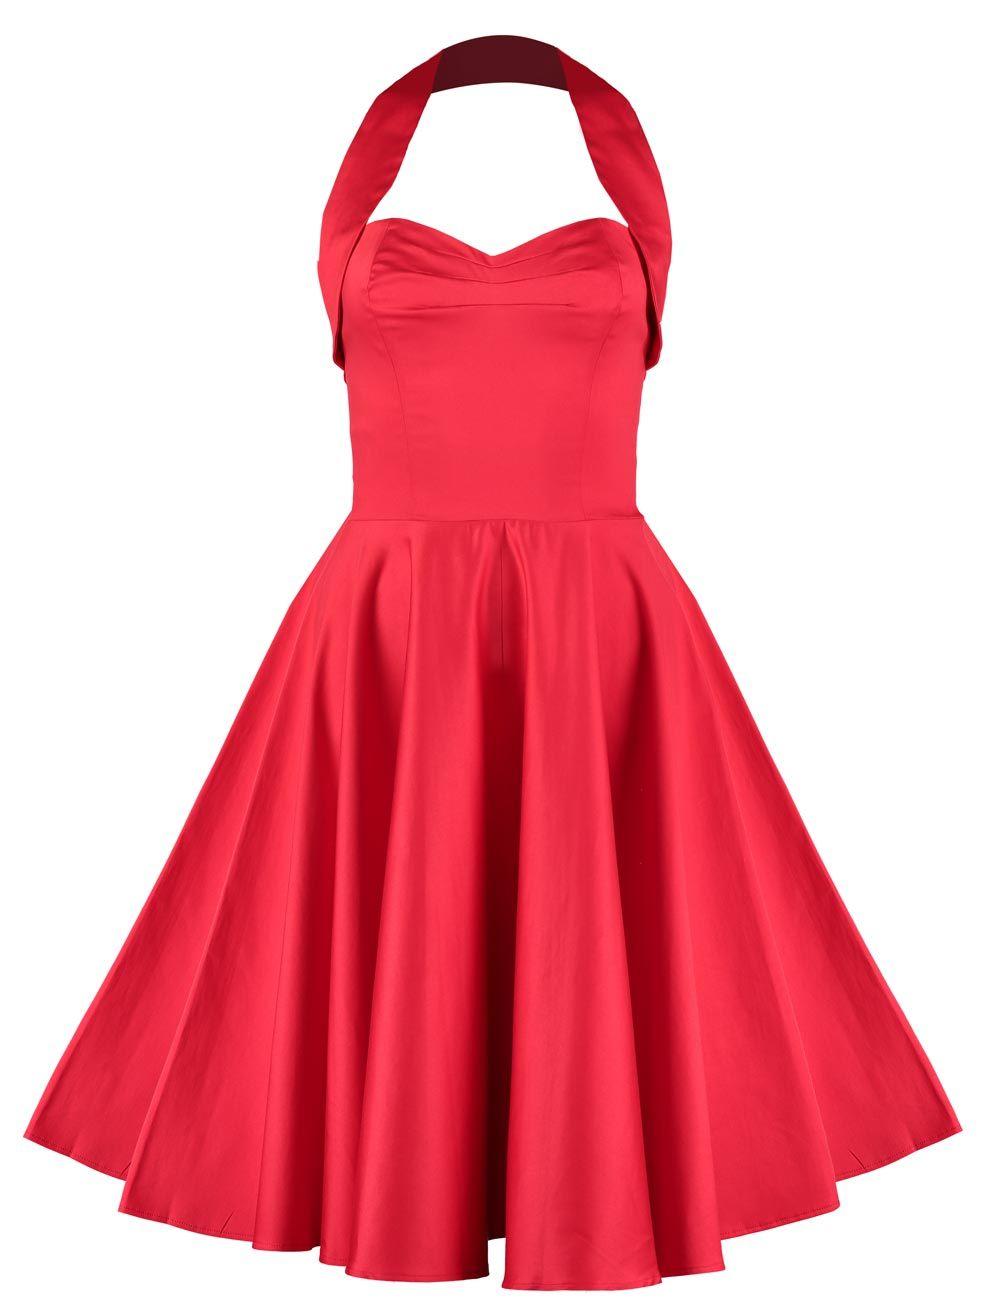 1950s style bridesmaid dress mariage pinterest 1950s style 1950s style bridesmaid dress ombrellifo Choice Image